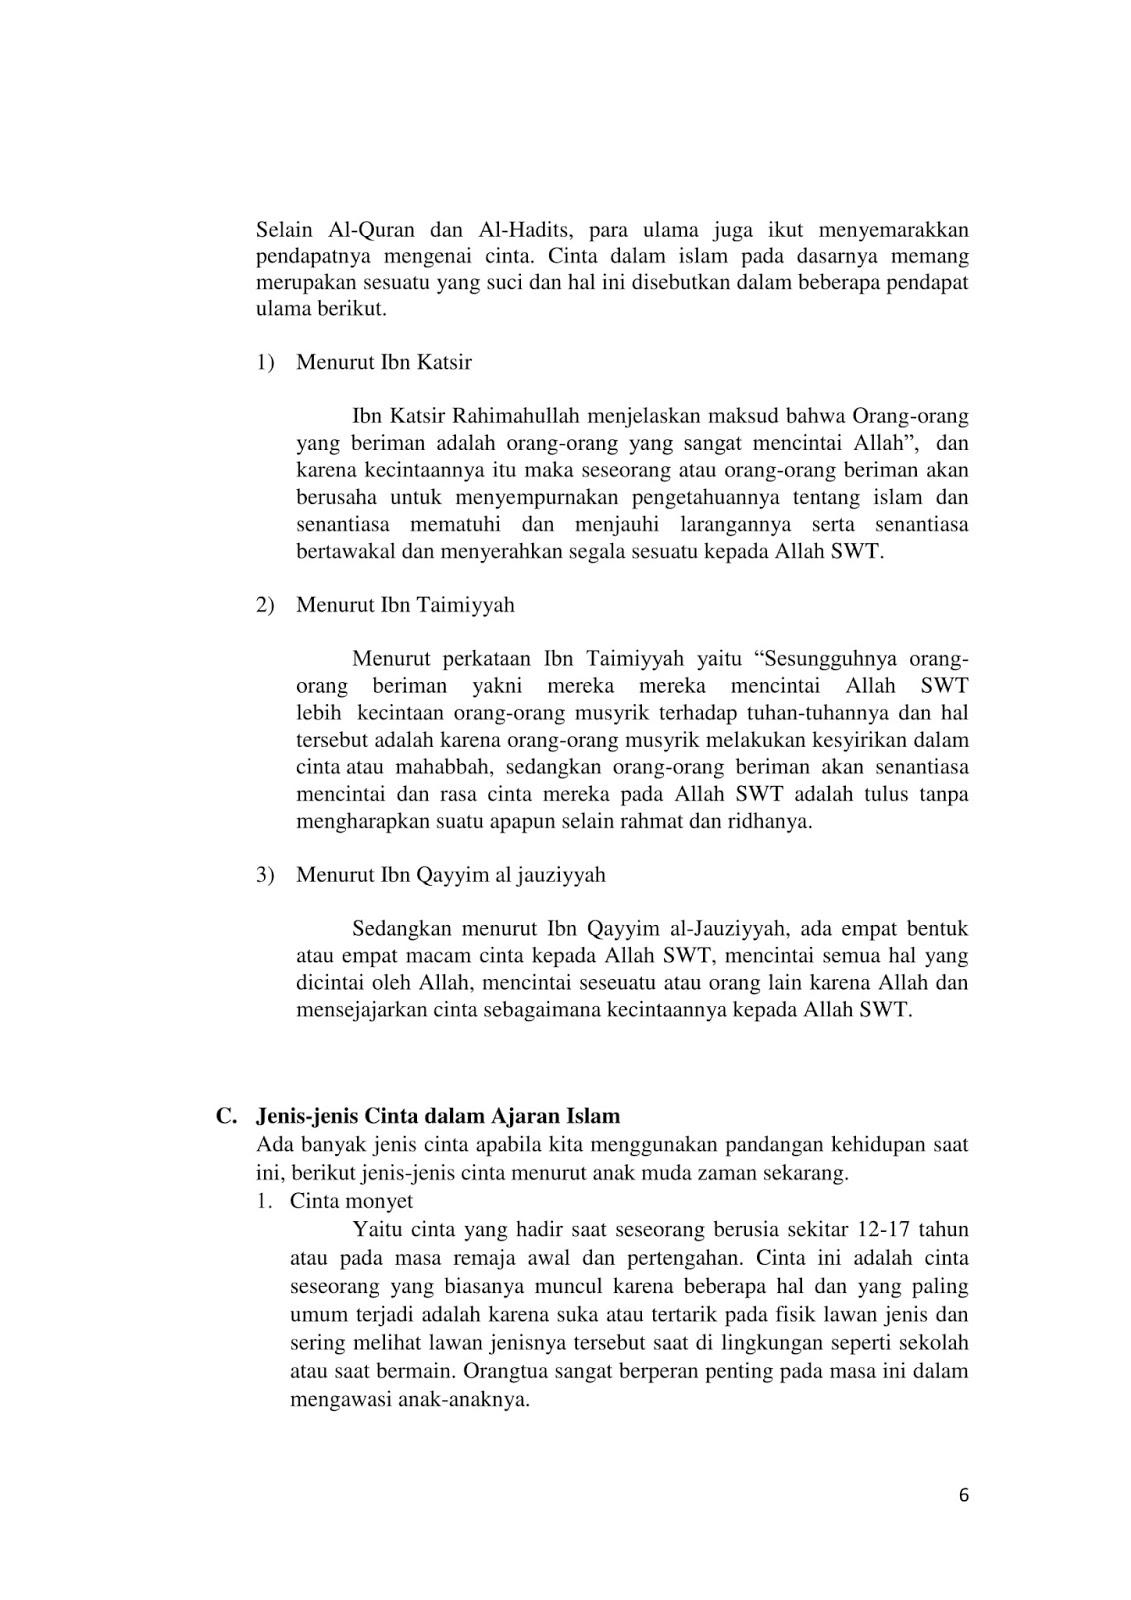 Essay parlement remaja islam